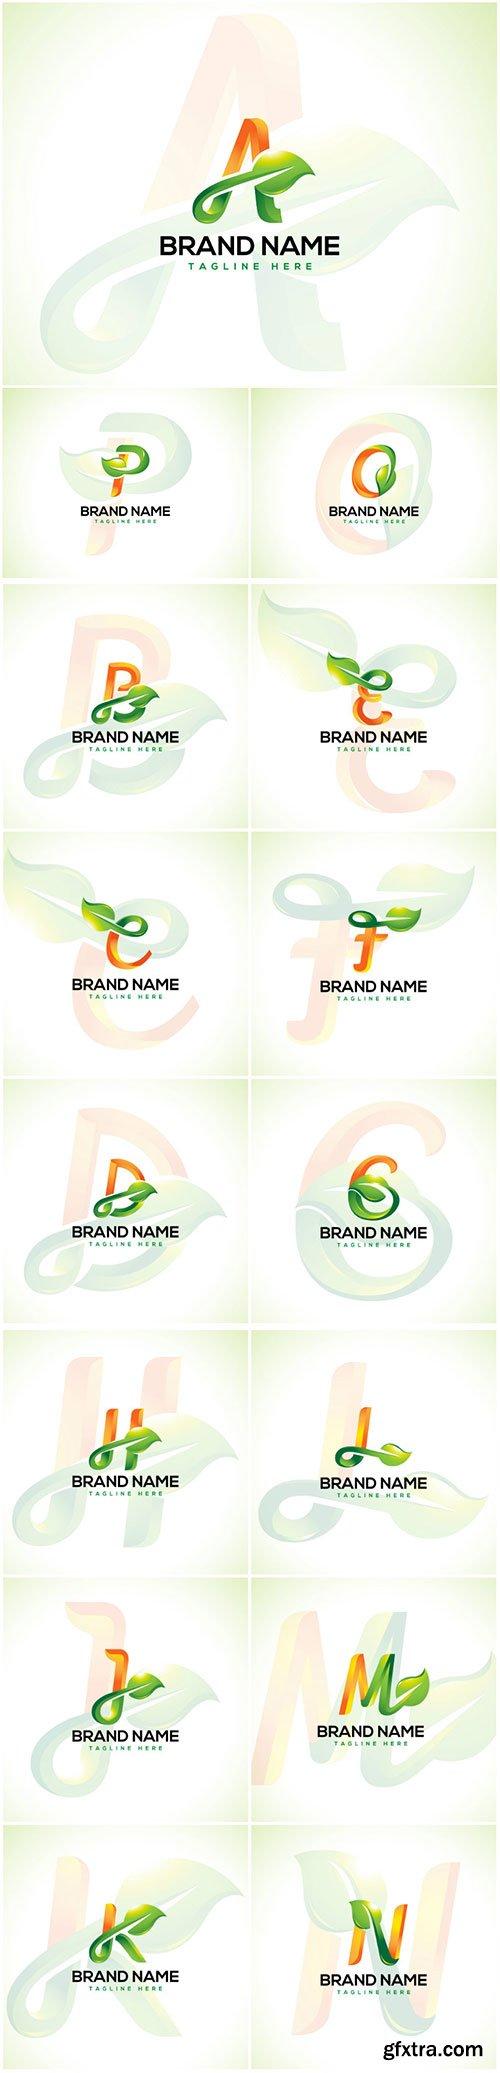 Leaf logo and initial letter logo concept